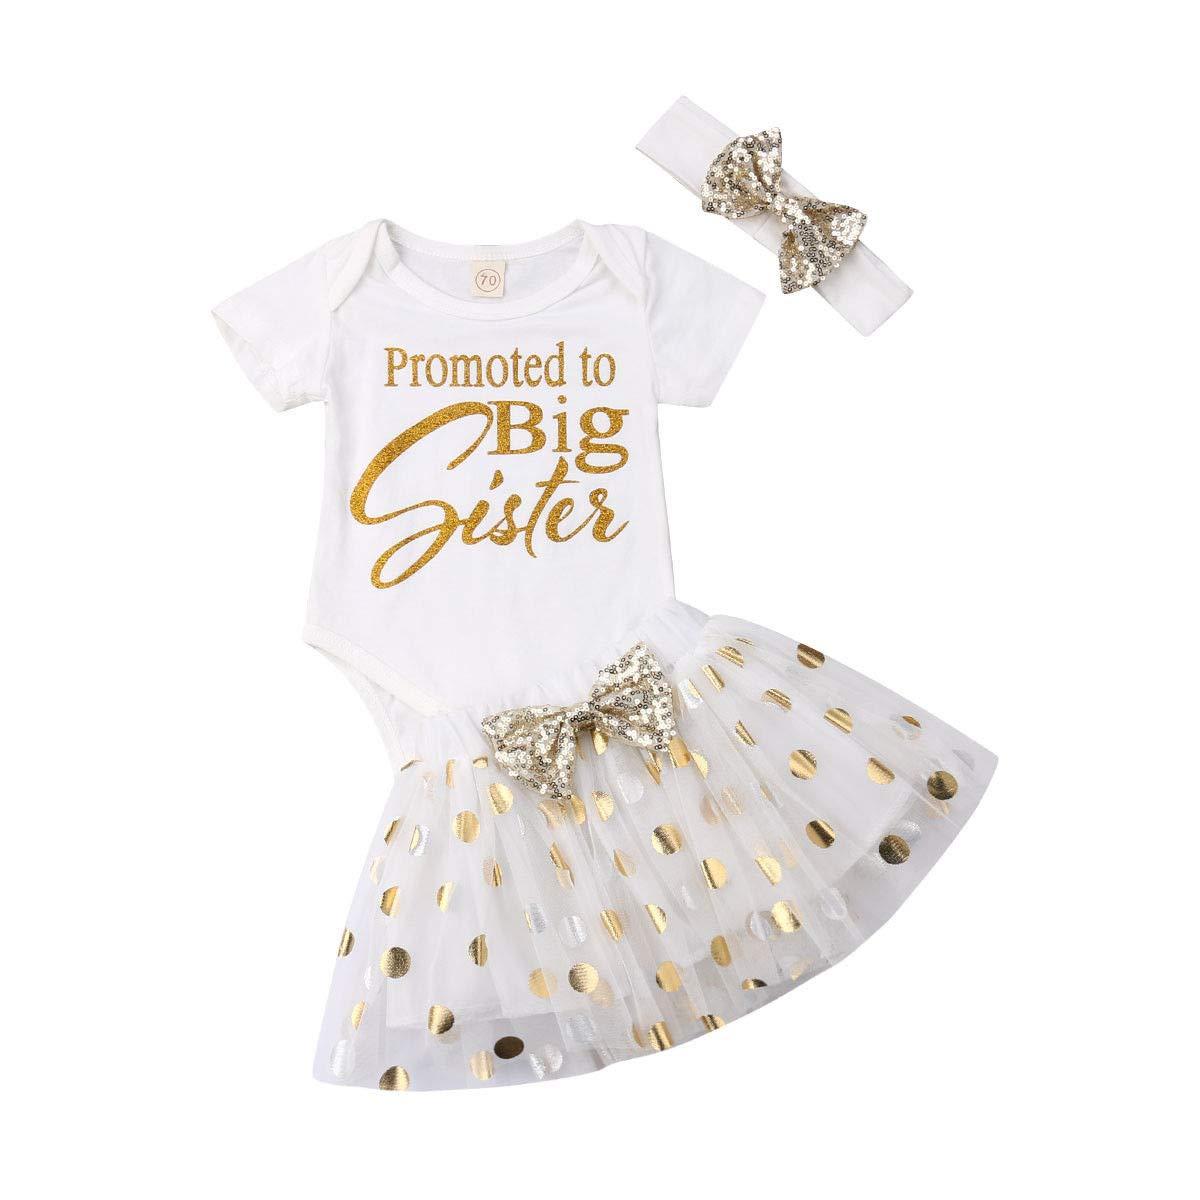 ae12e719f Amazon.com: 3PCS Baby Girls 1st Birthday Outfit Short Sleeve Romper Bodysuit  Tutu Skirt with Headband Set 0-24M: Clothing